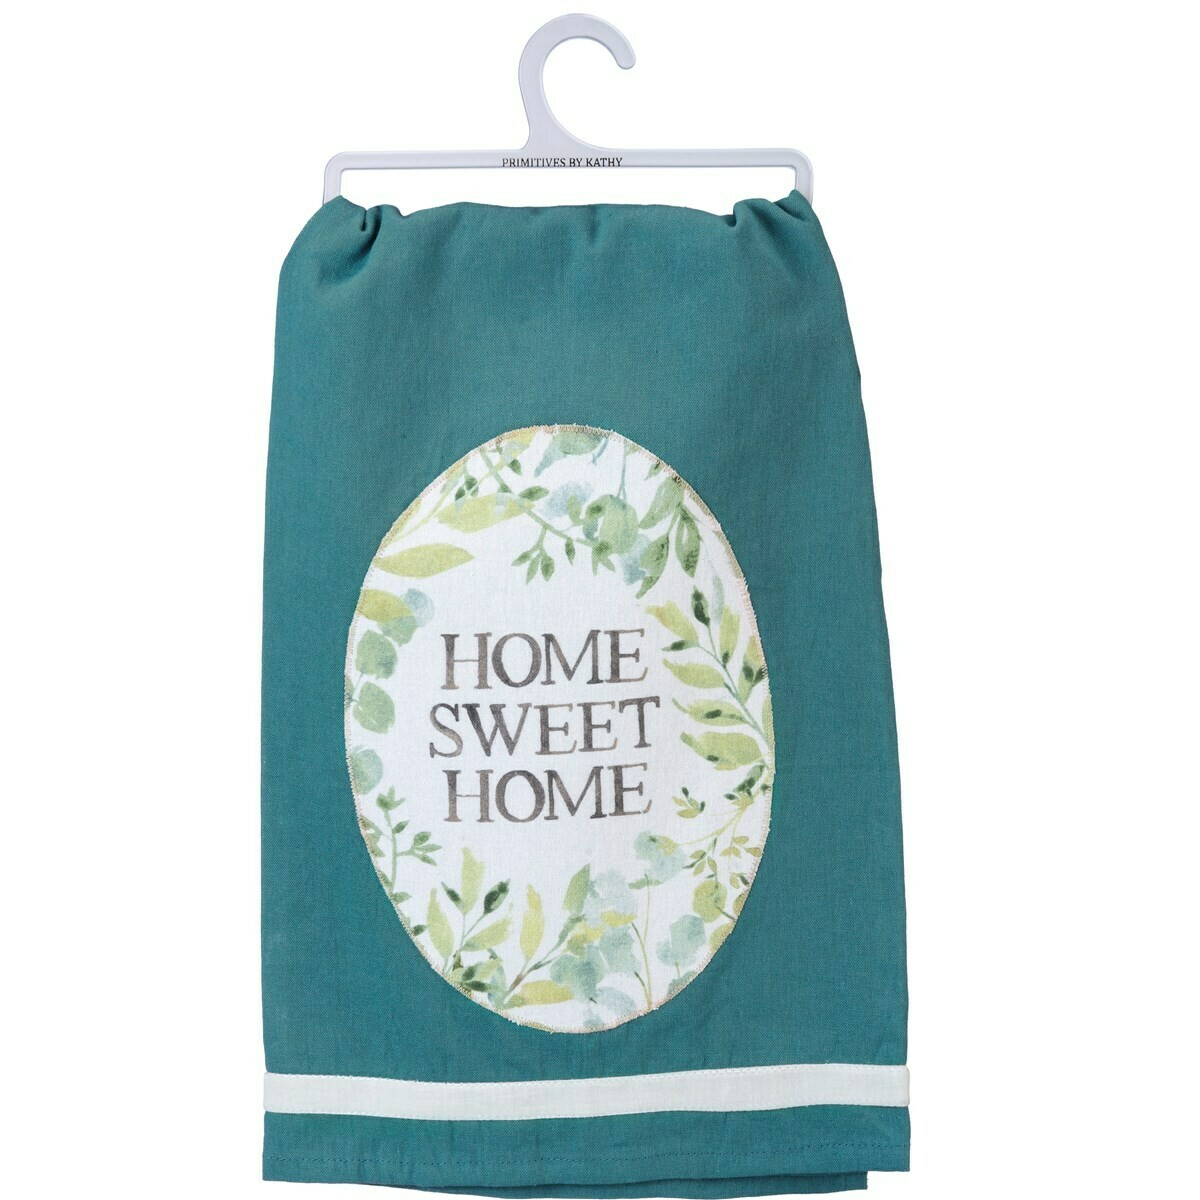 Home Sweet Home Dish Towel